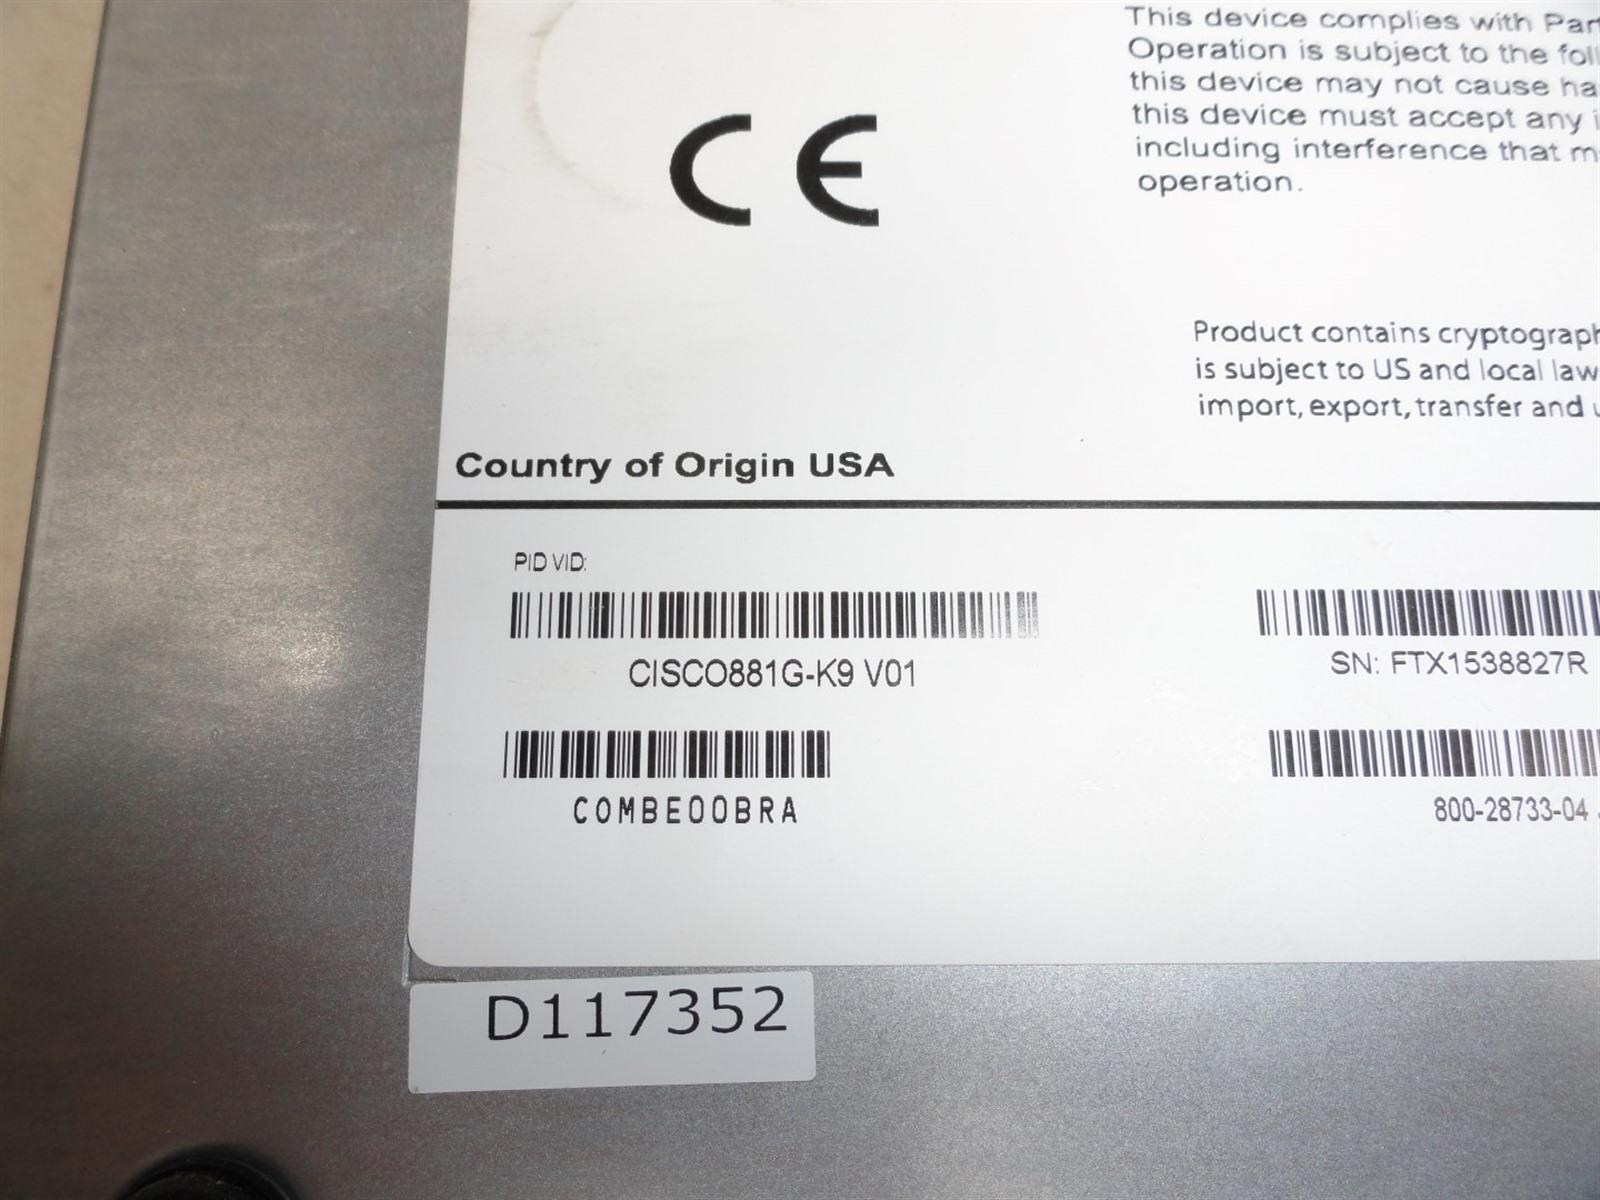 Details about Cisco 881G CISCO881G-K9 3G Integrated Services Router  w/Advipservices License